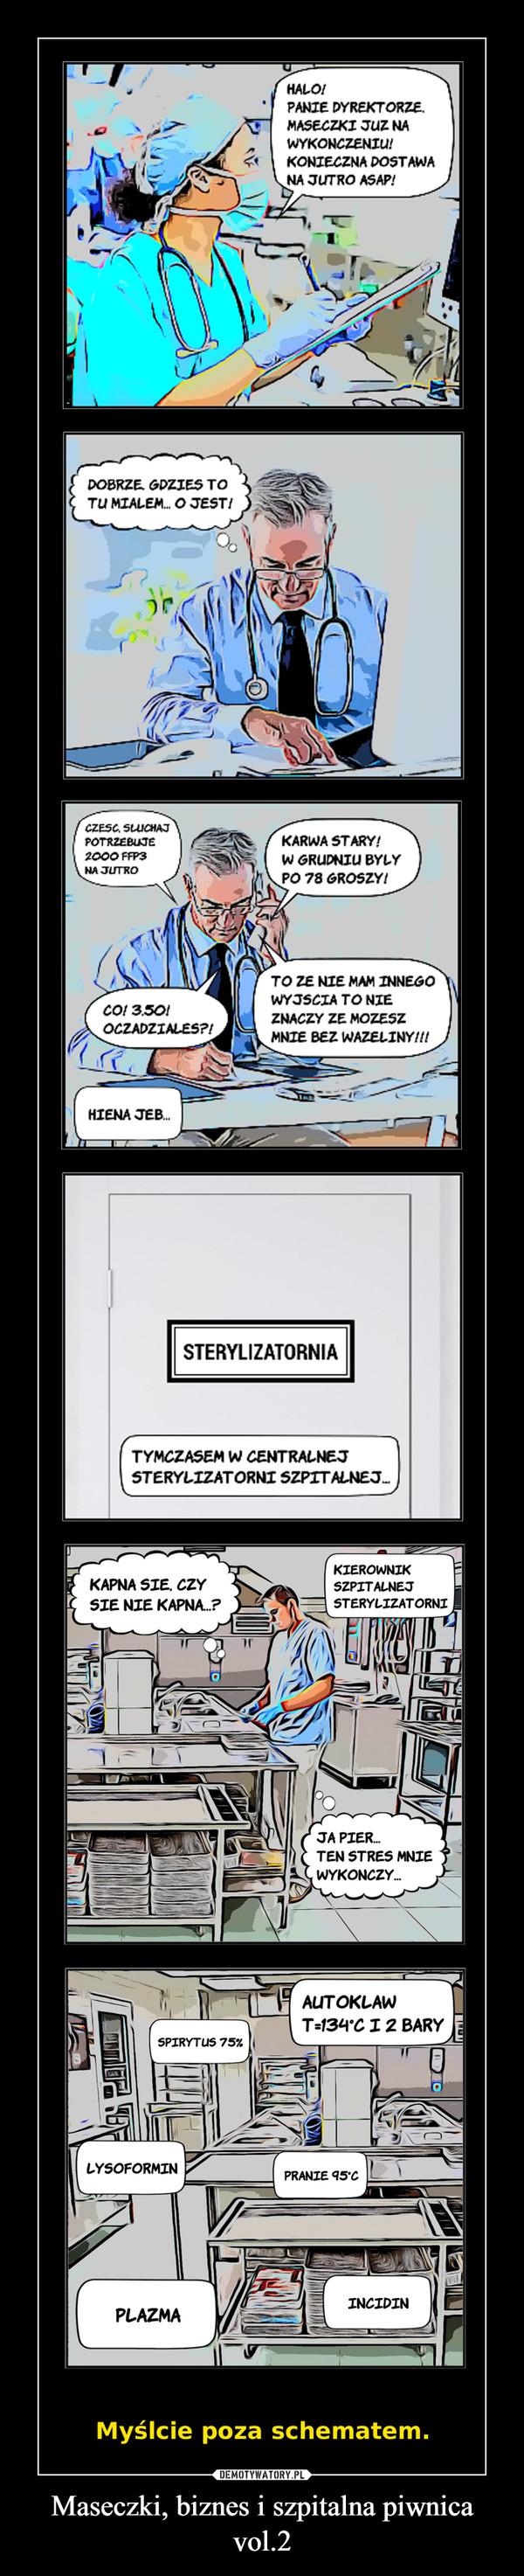 Maseczki, biznes i szpitalna piwnica vol.2 –